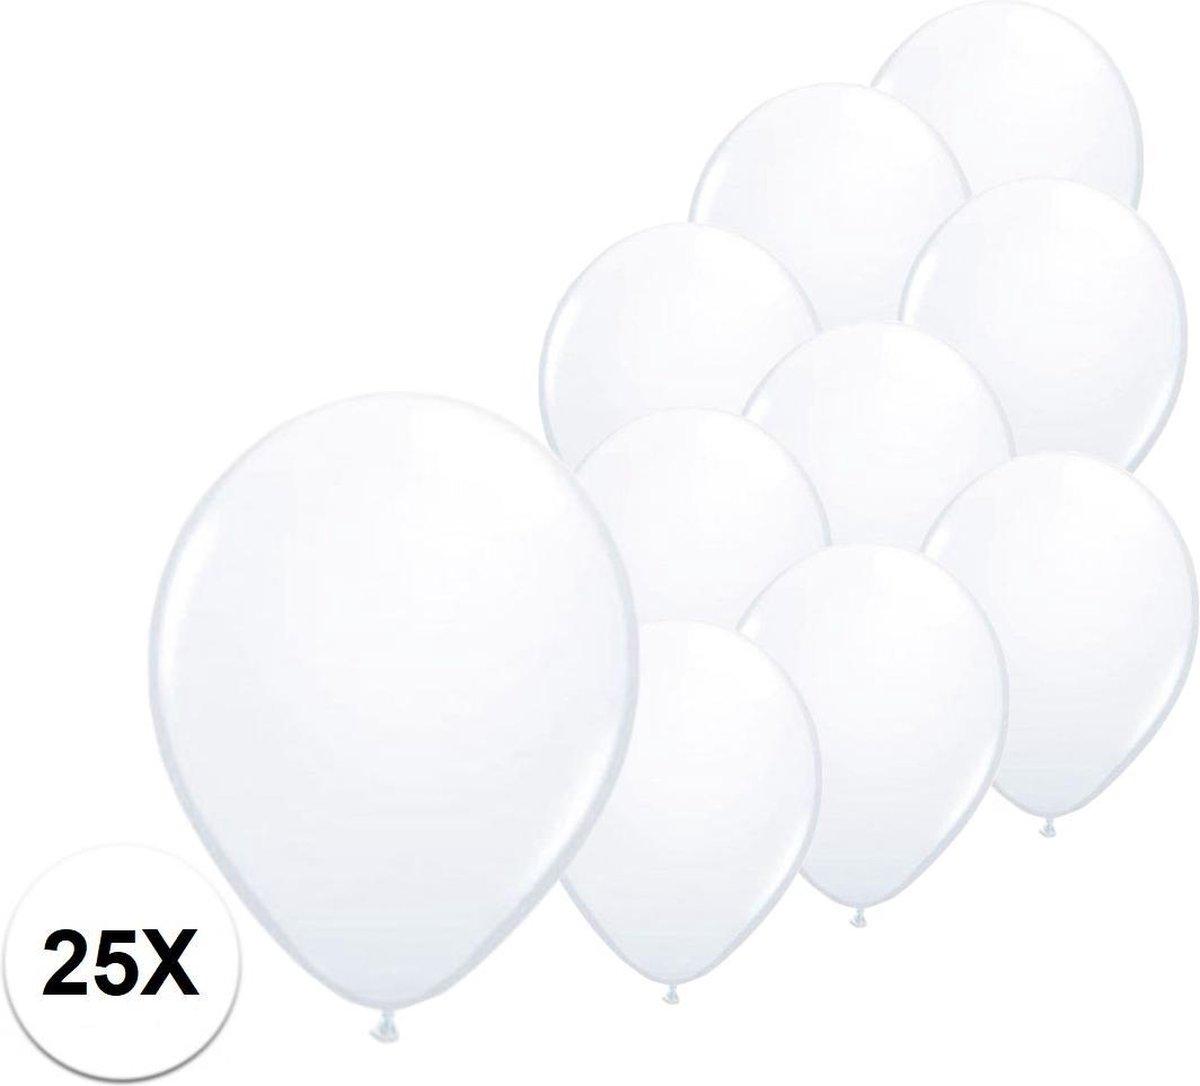 Witte Ballonnen Verjaardag Versiering Witte Helium Ballonnen Bruiloft Feest Versiering EK WK Konings